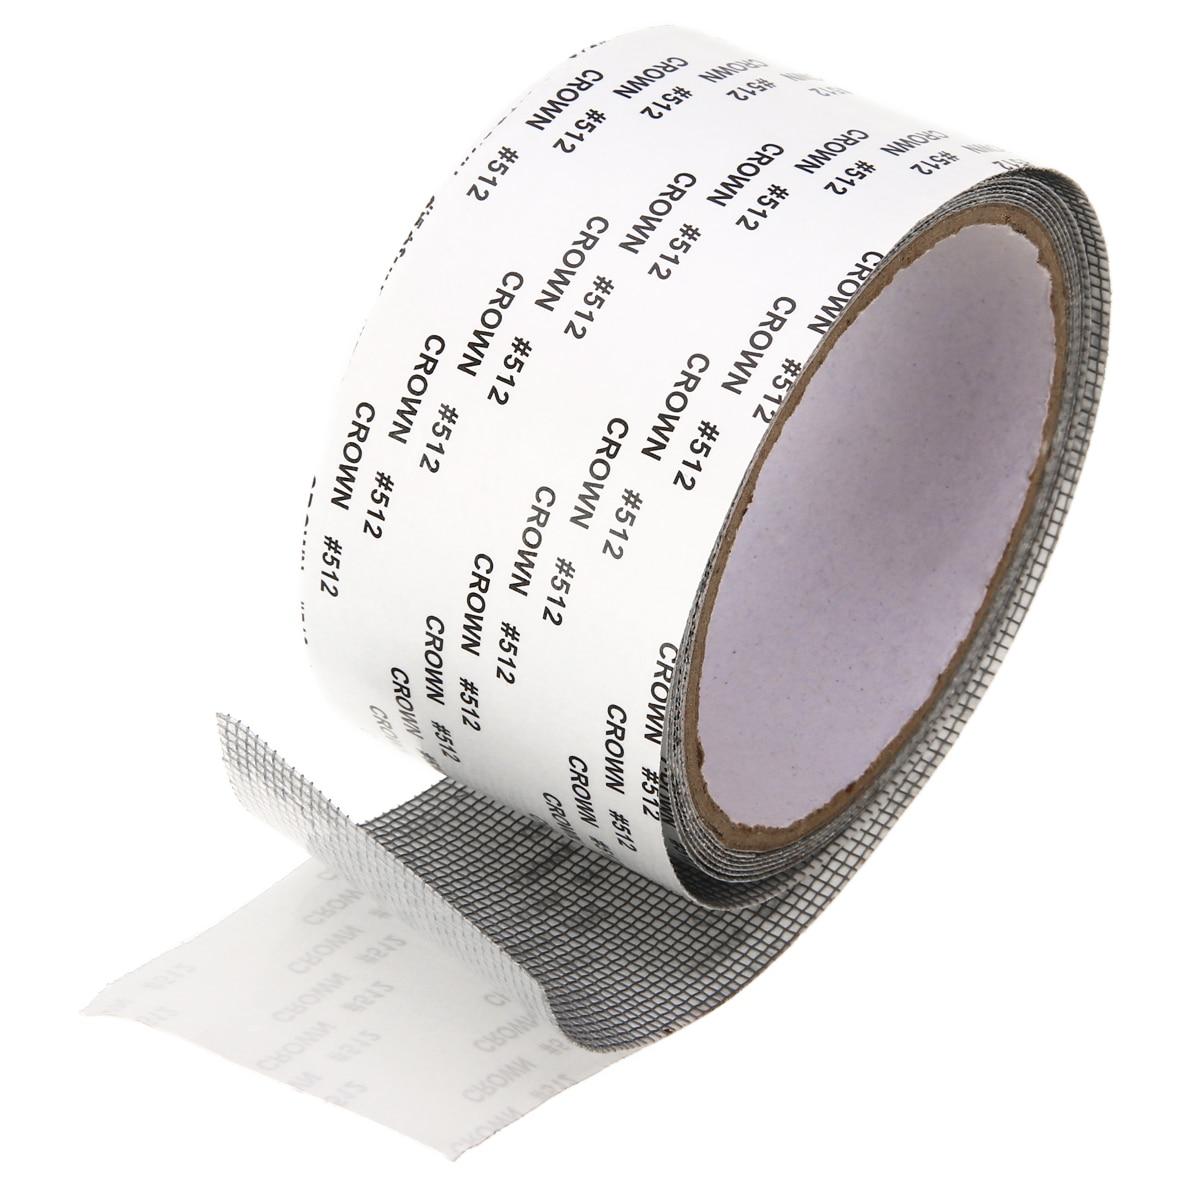 Screen Patch Repair Kit Window Screen Tape Fiberglass Covering Mesh 5*200cm